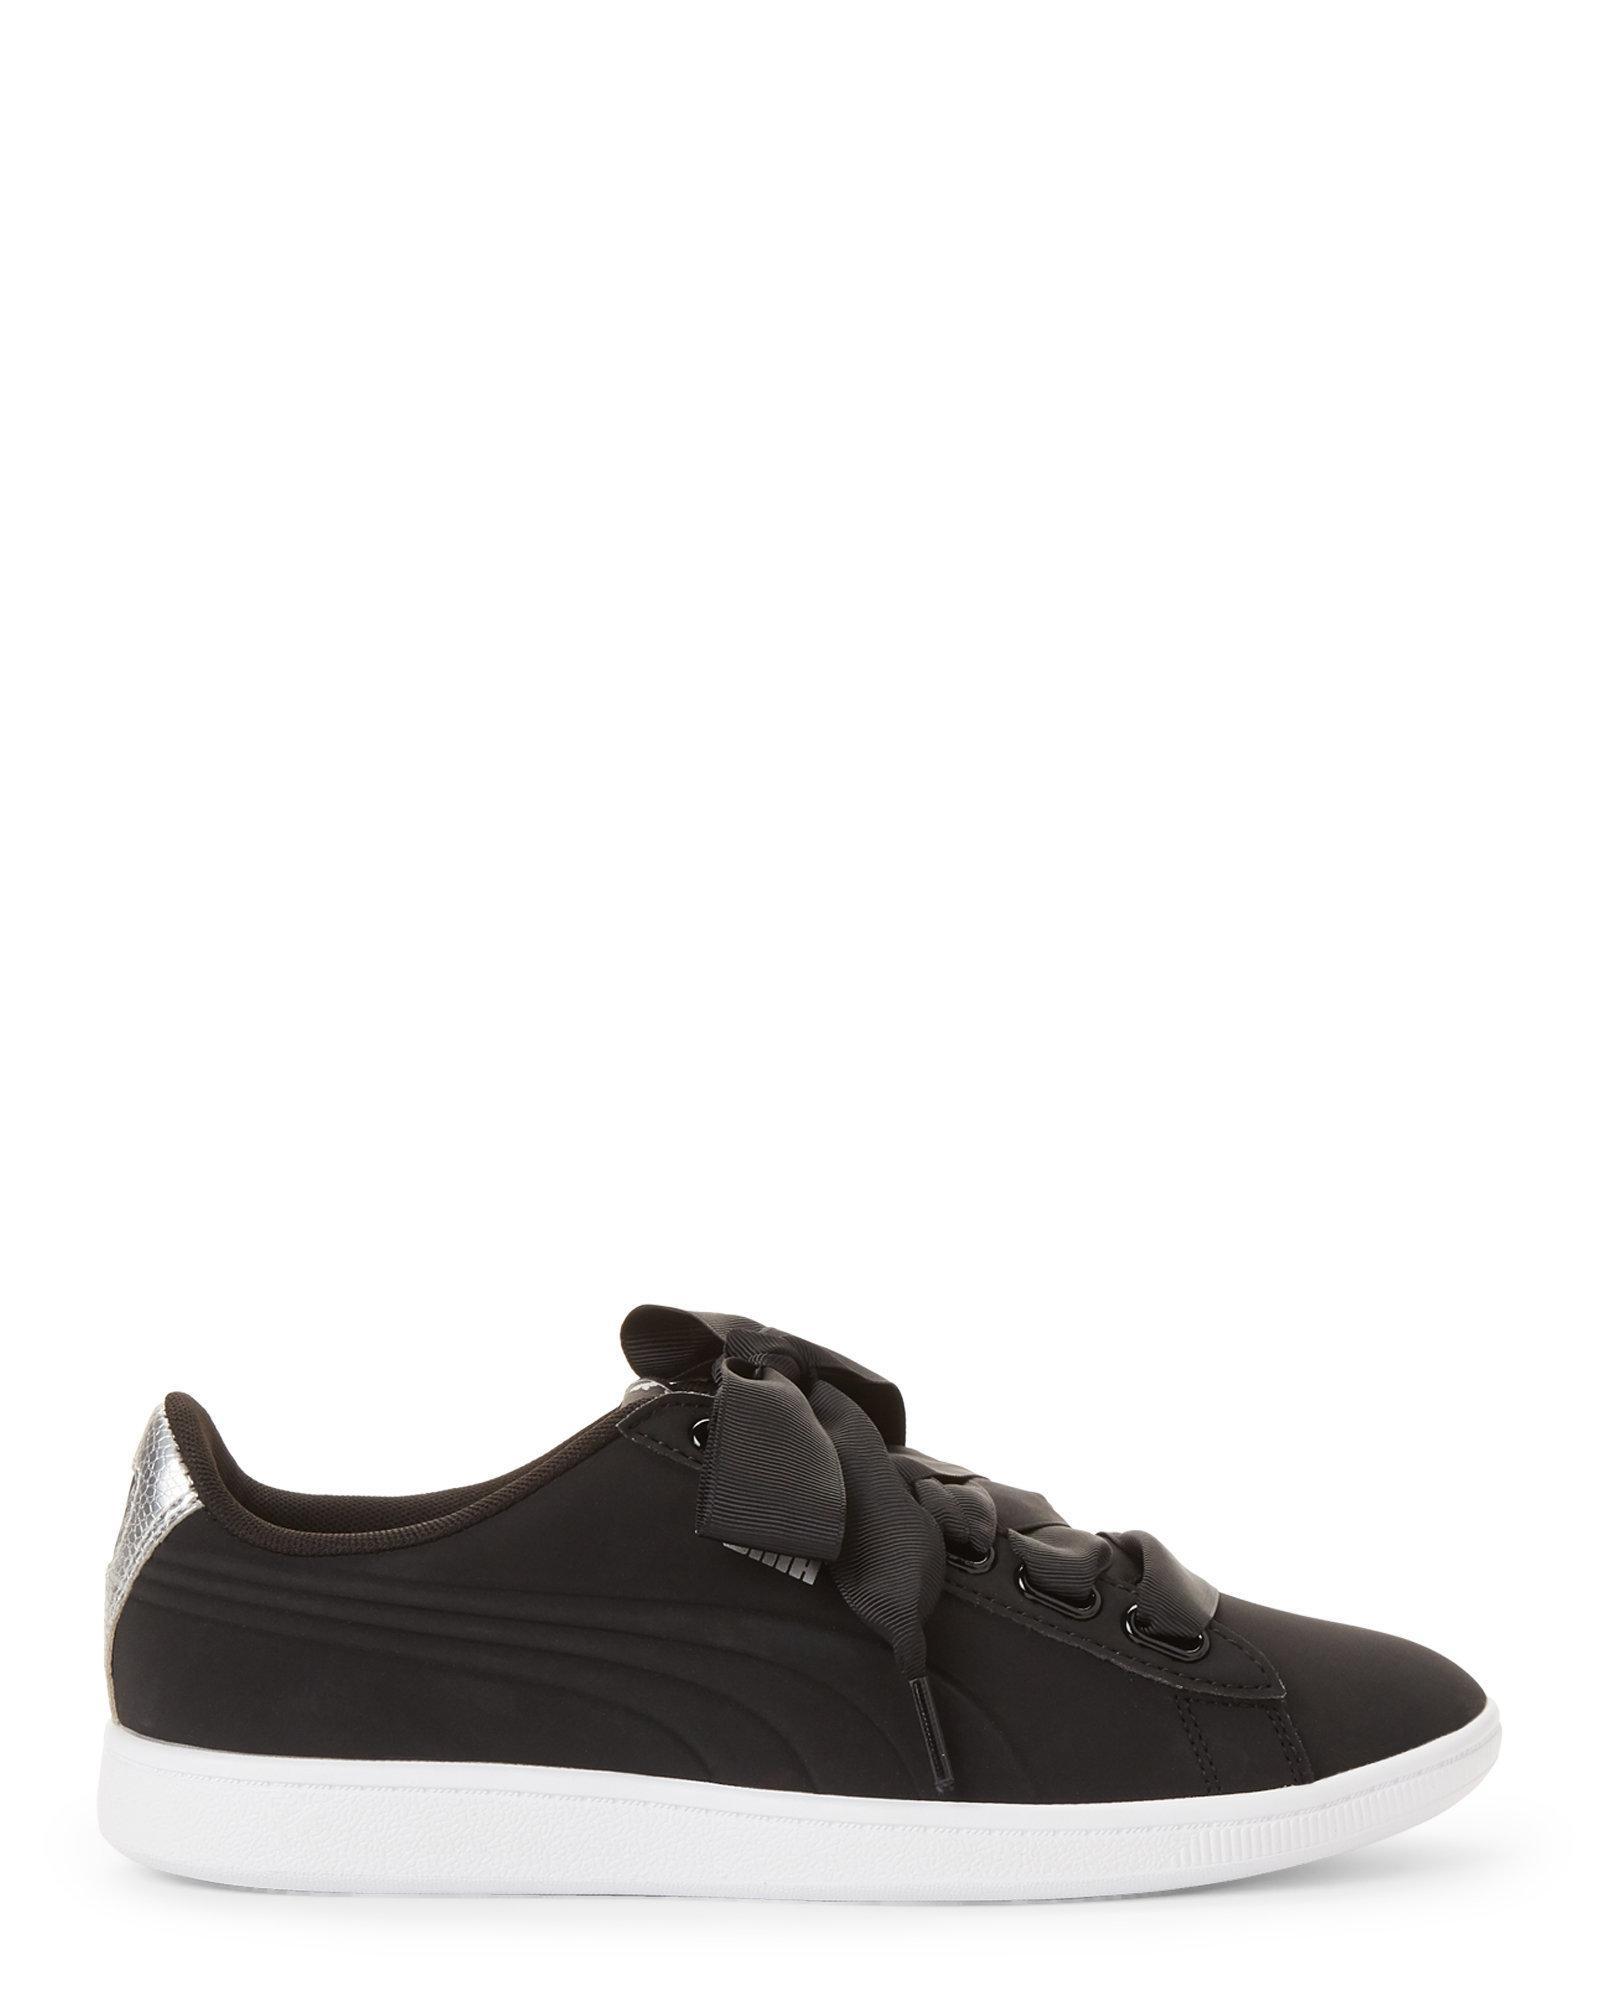 a0fa2a85495 Lyst - Puma Vikky Ribbon Sneakers in Black